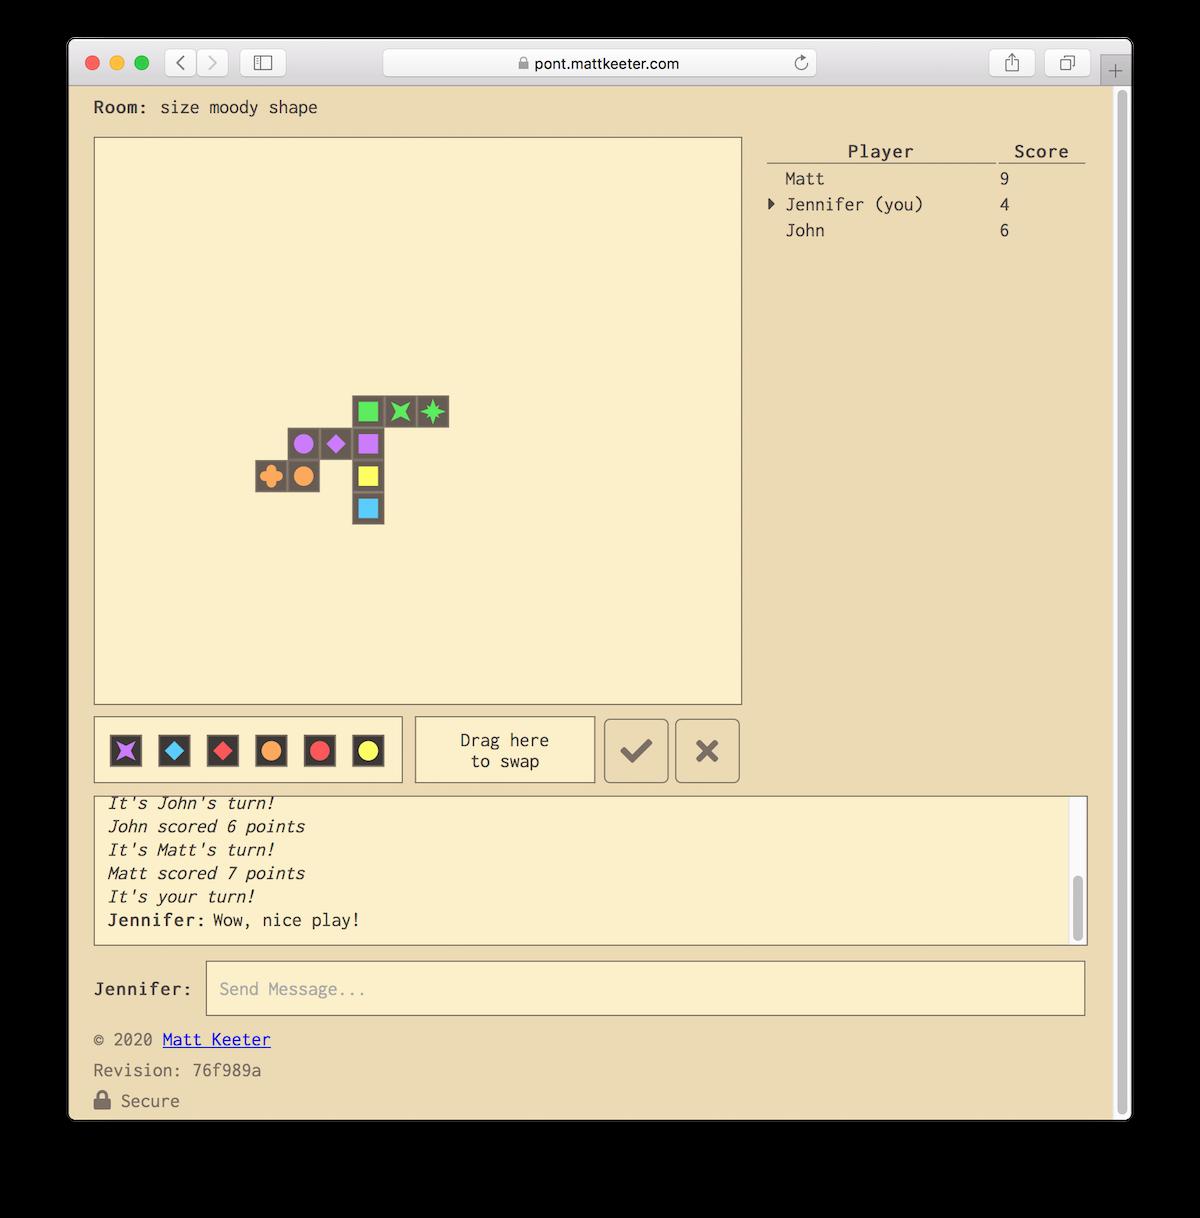 Screenshot of the Pont board game